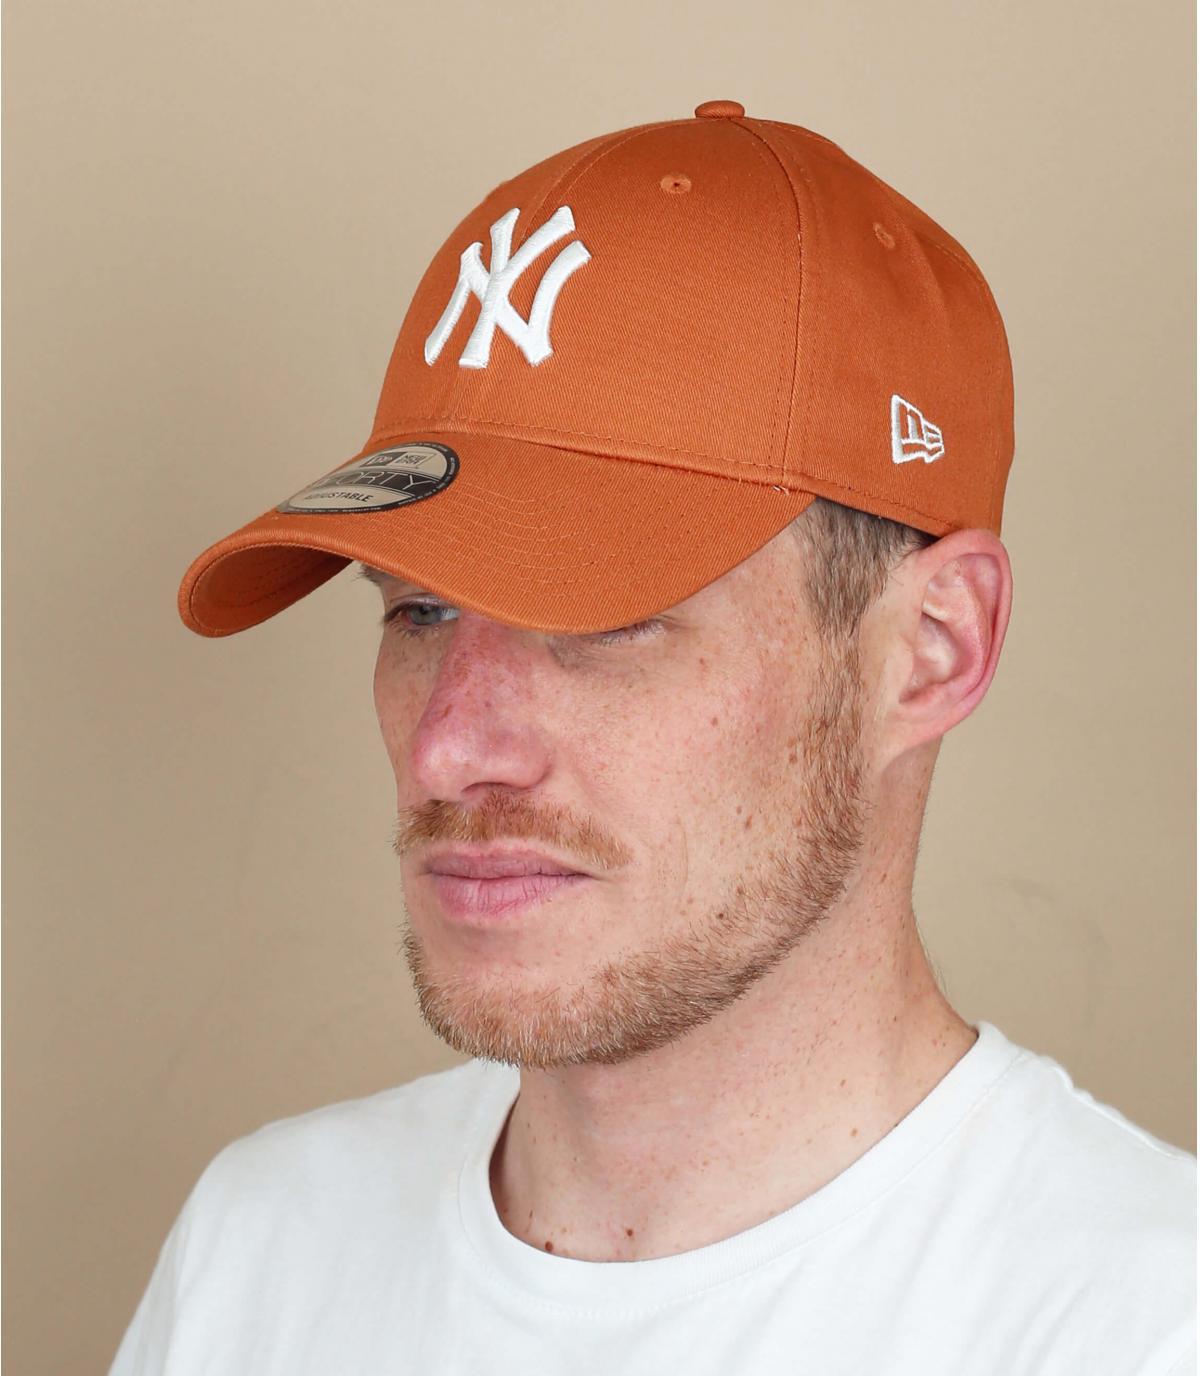 NY beige white cap